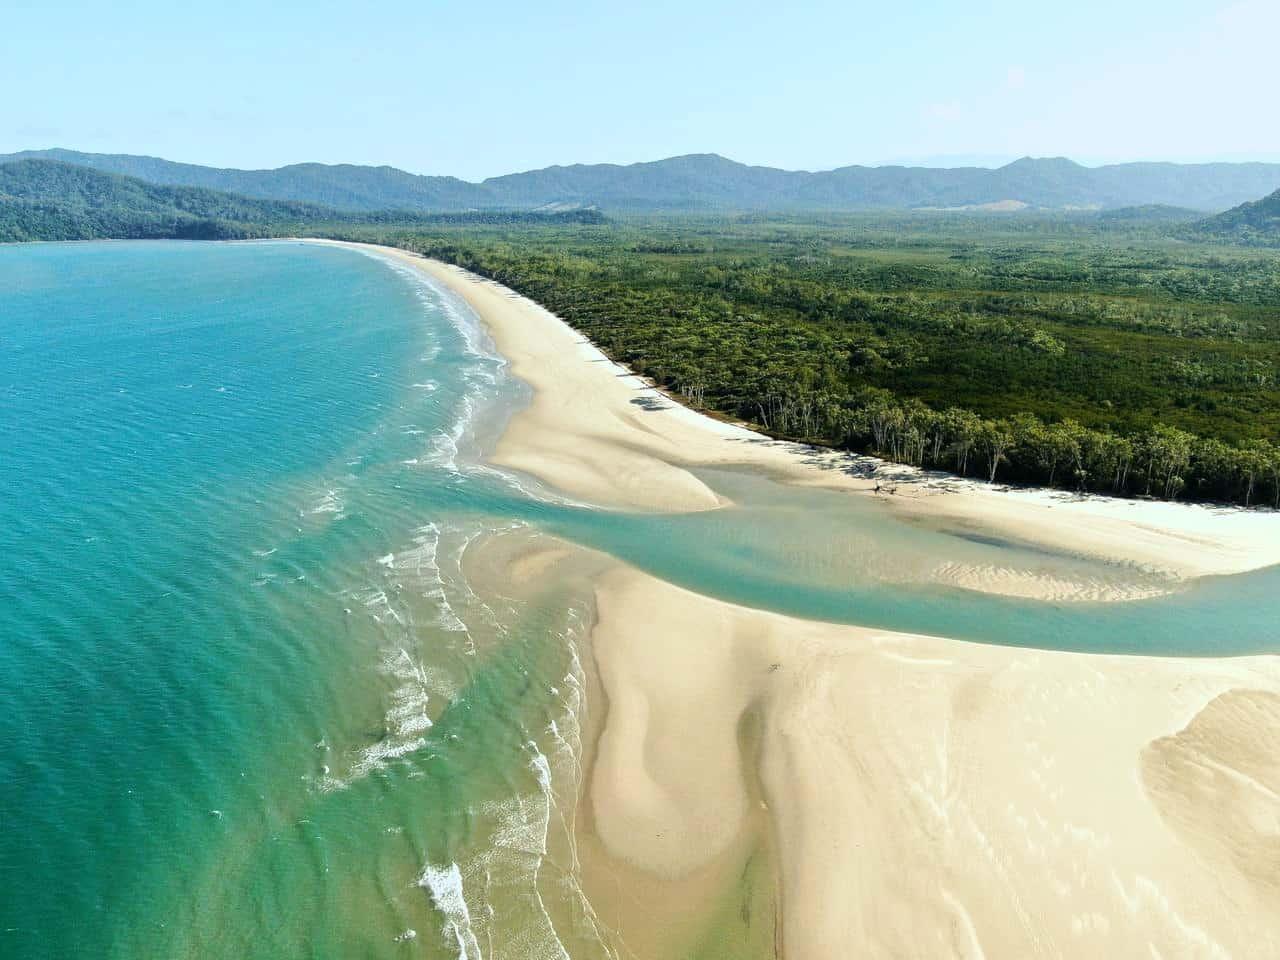 Thornton-Beach-Cape-Tribulation-Queensland-Australia-Travel-Mermaid